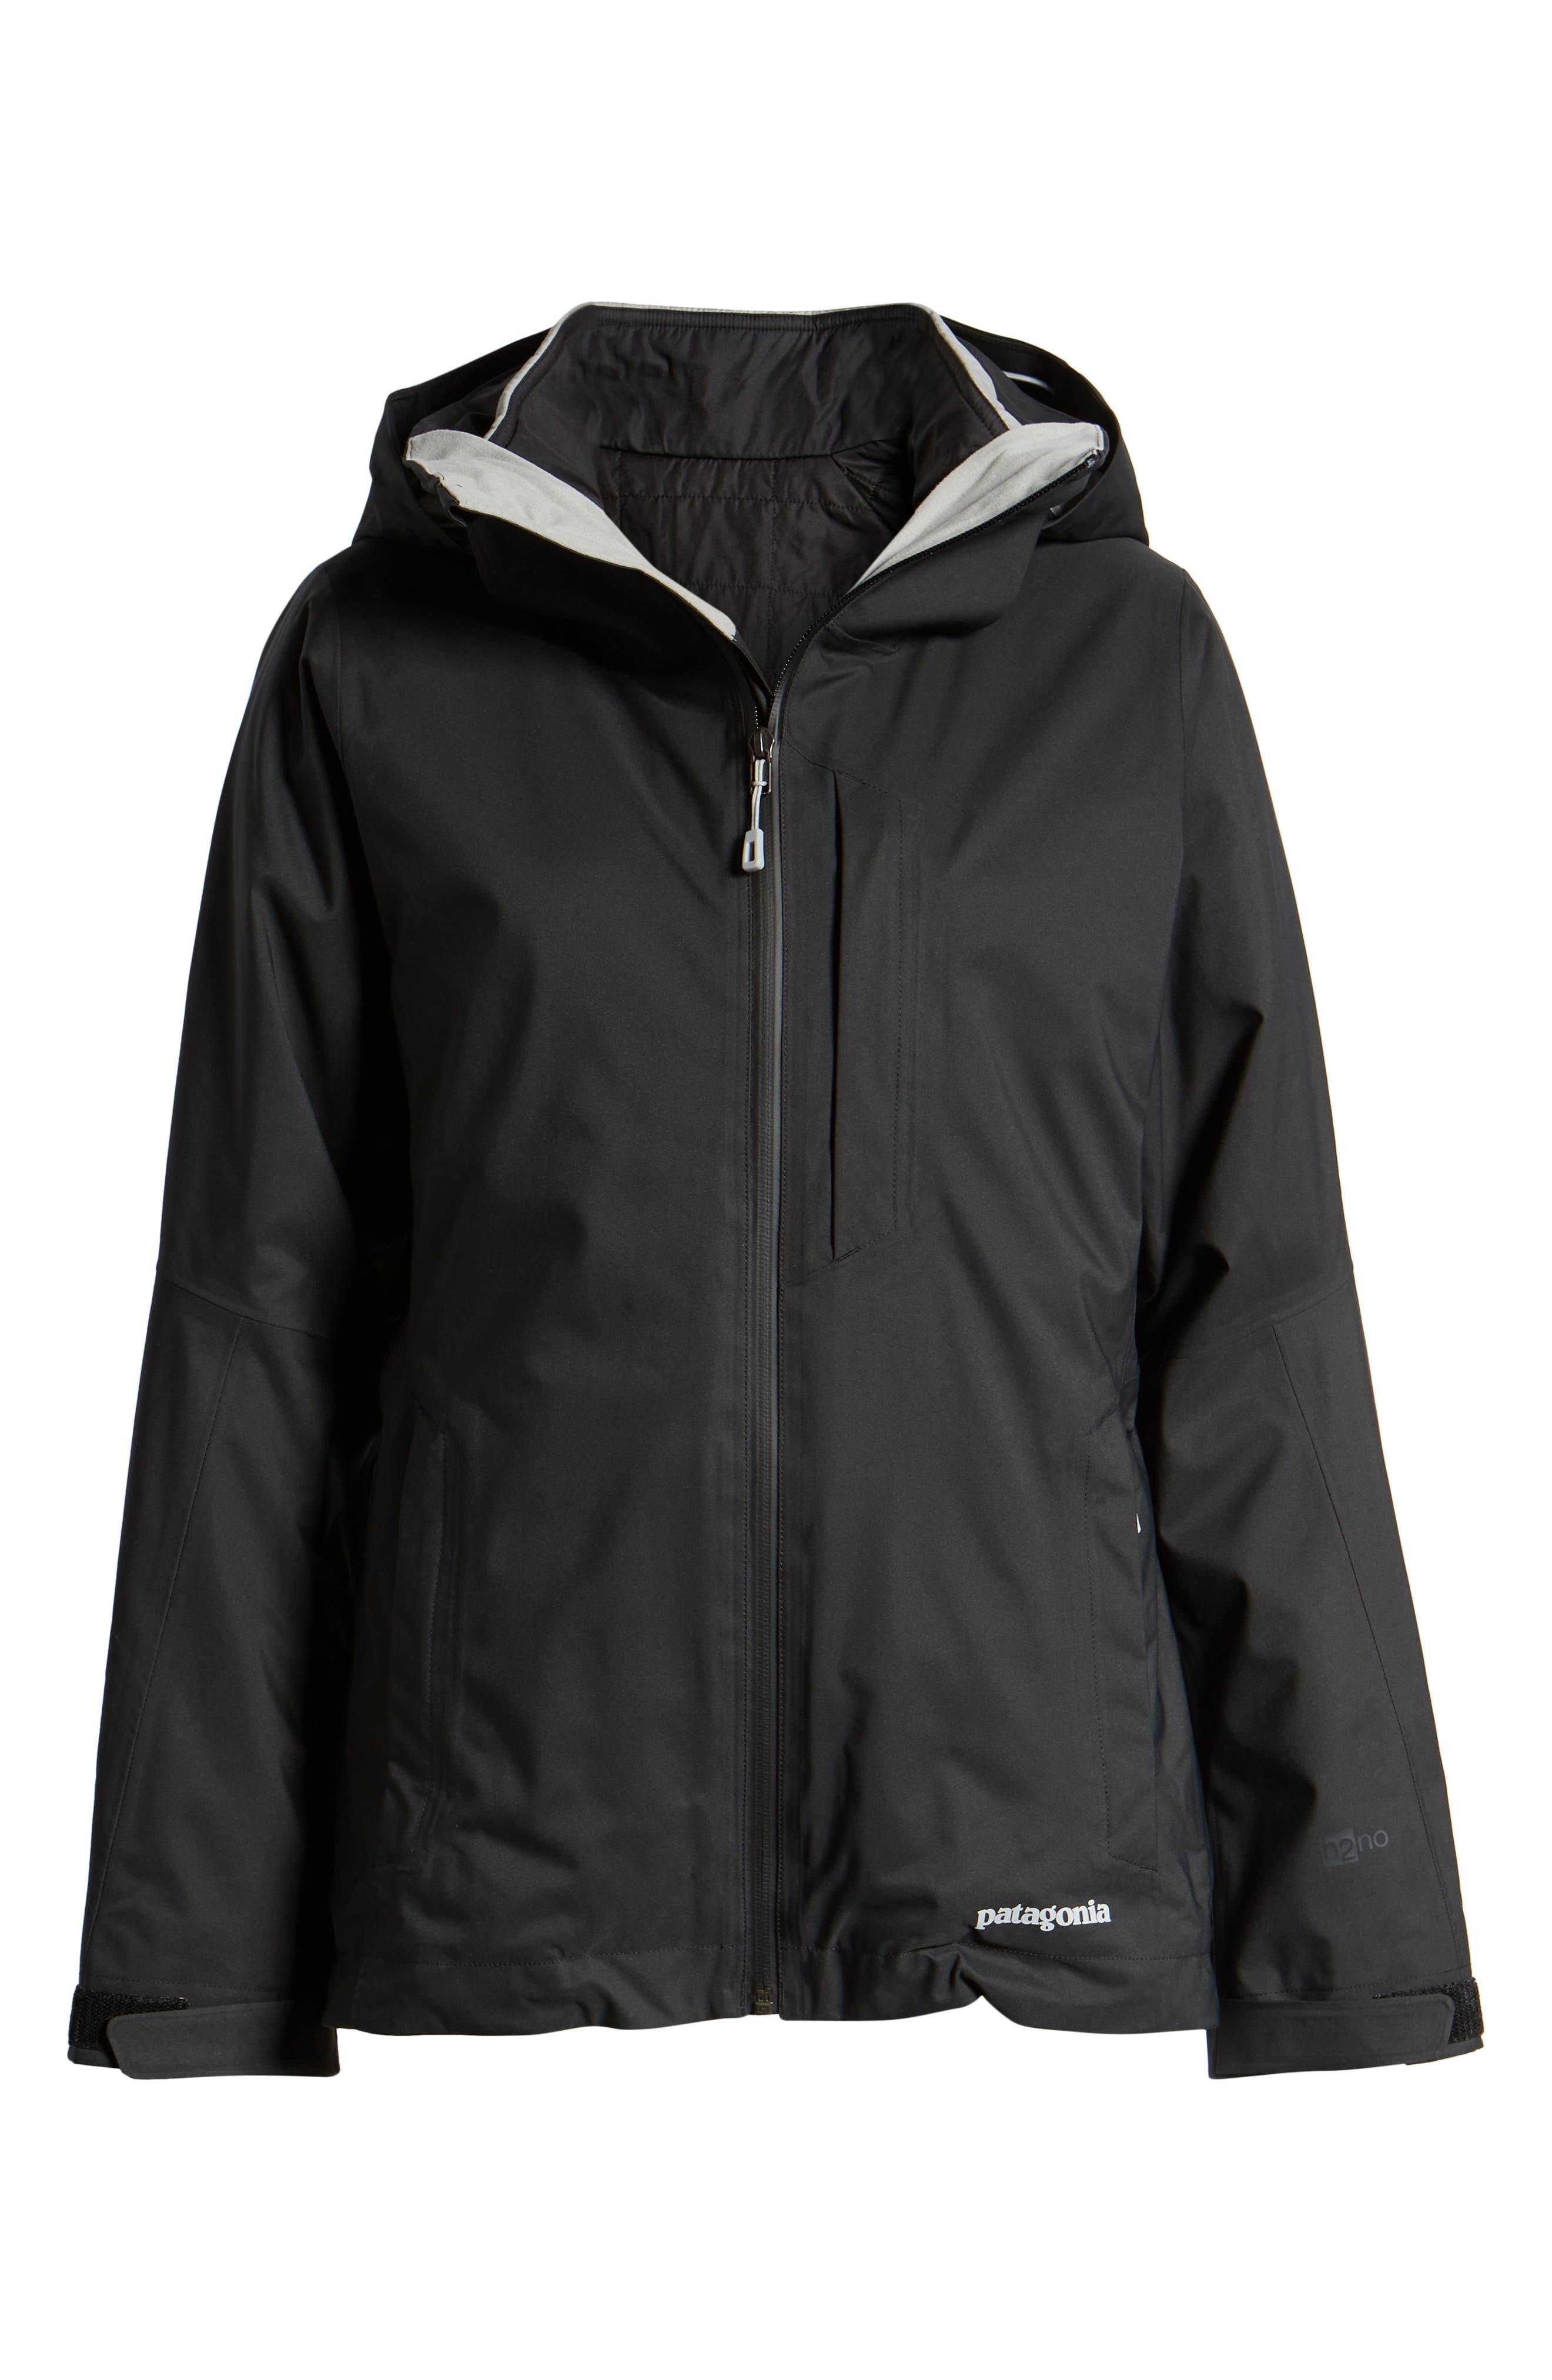 Snowbelle 3-in-1 Jacket,                             Alternate thumbnail 5, color,                             BLACK